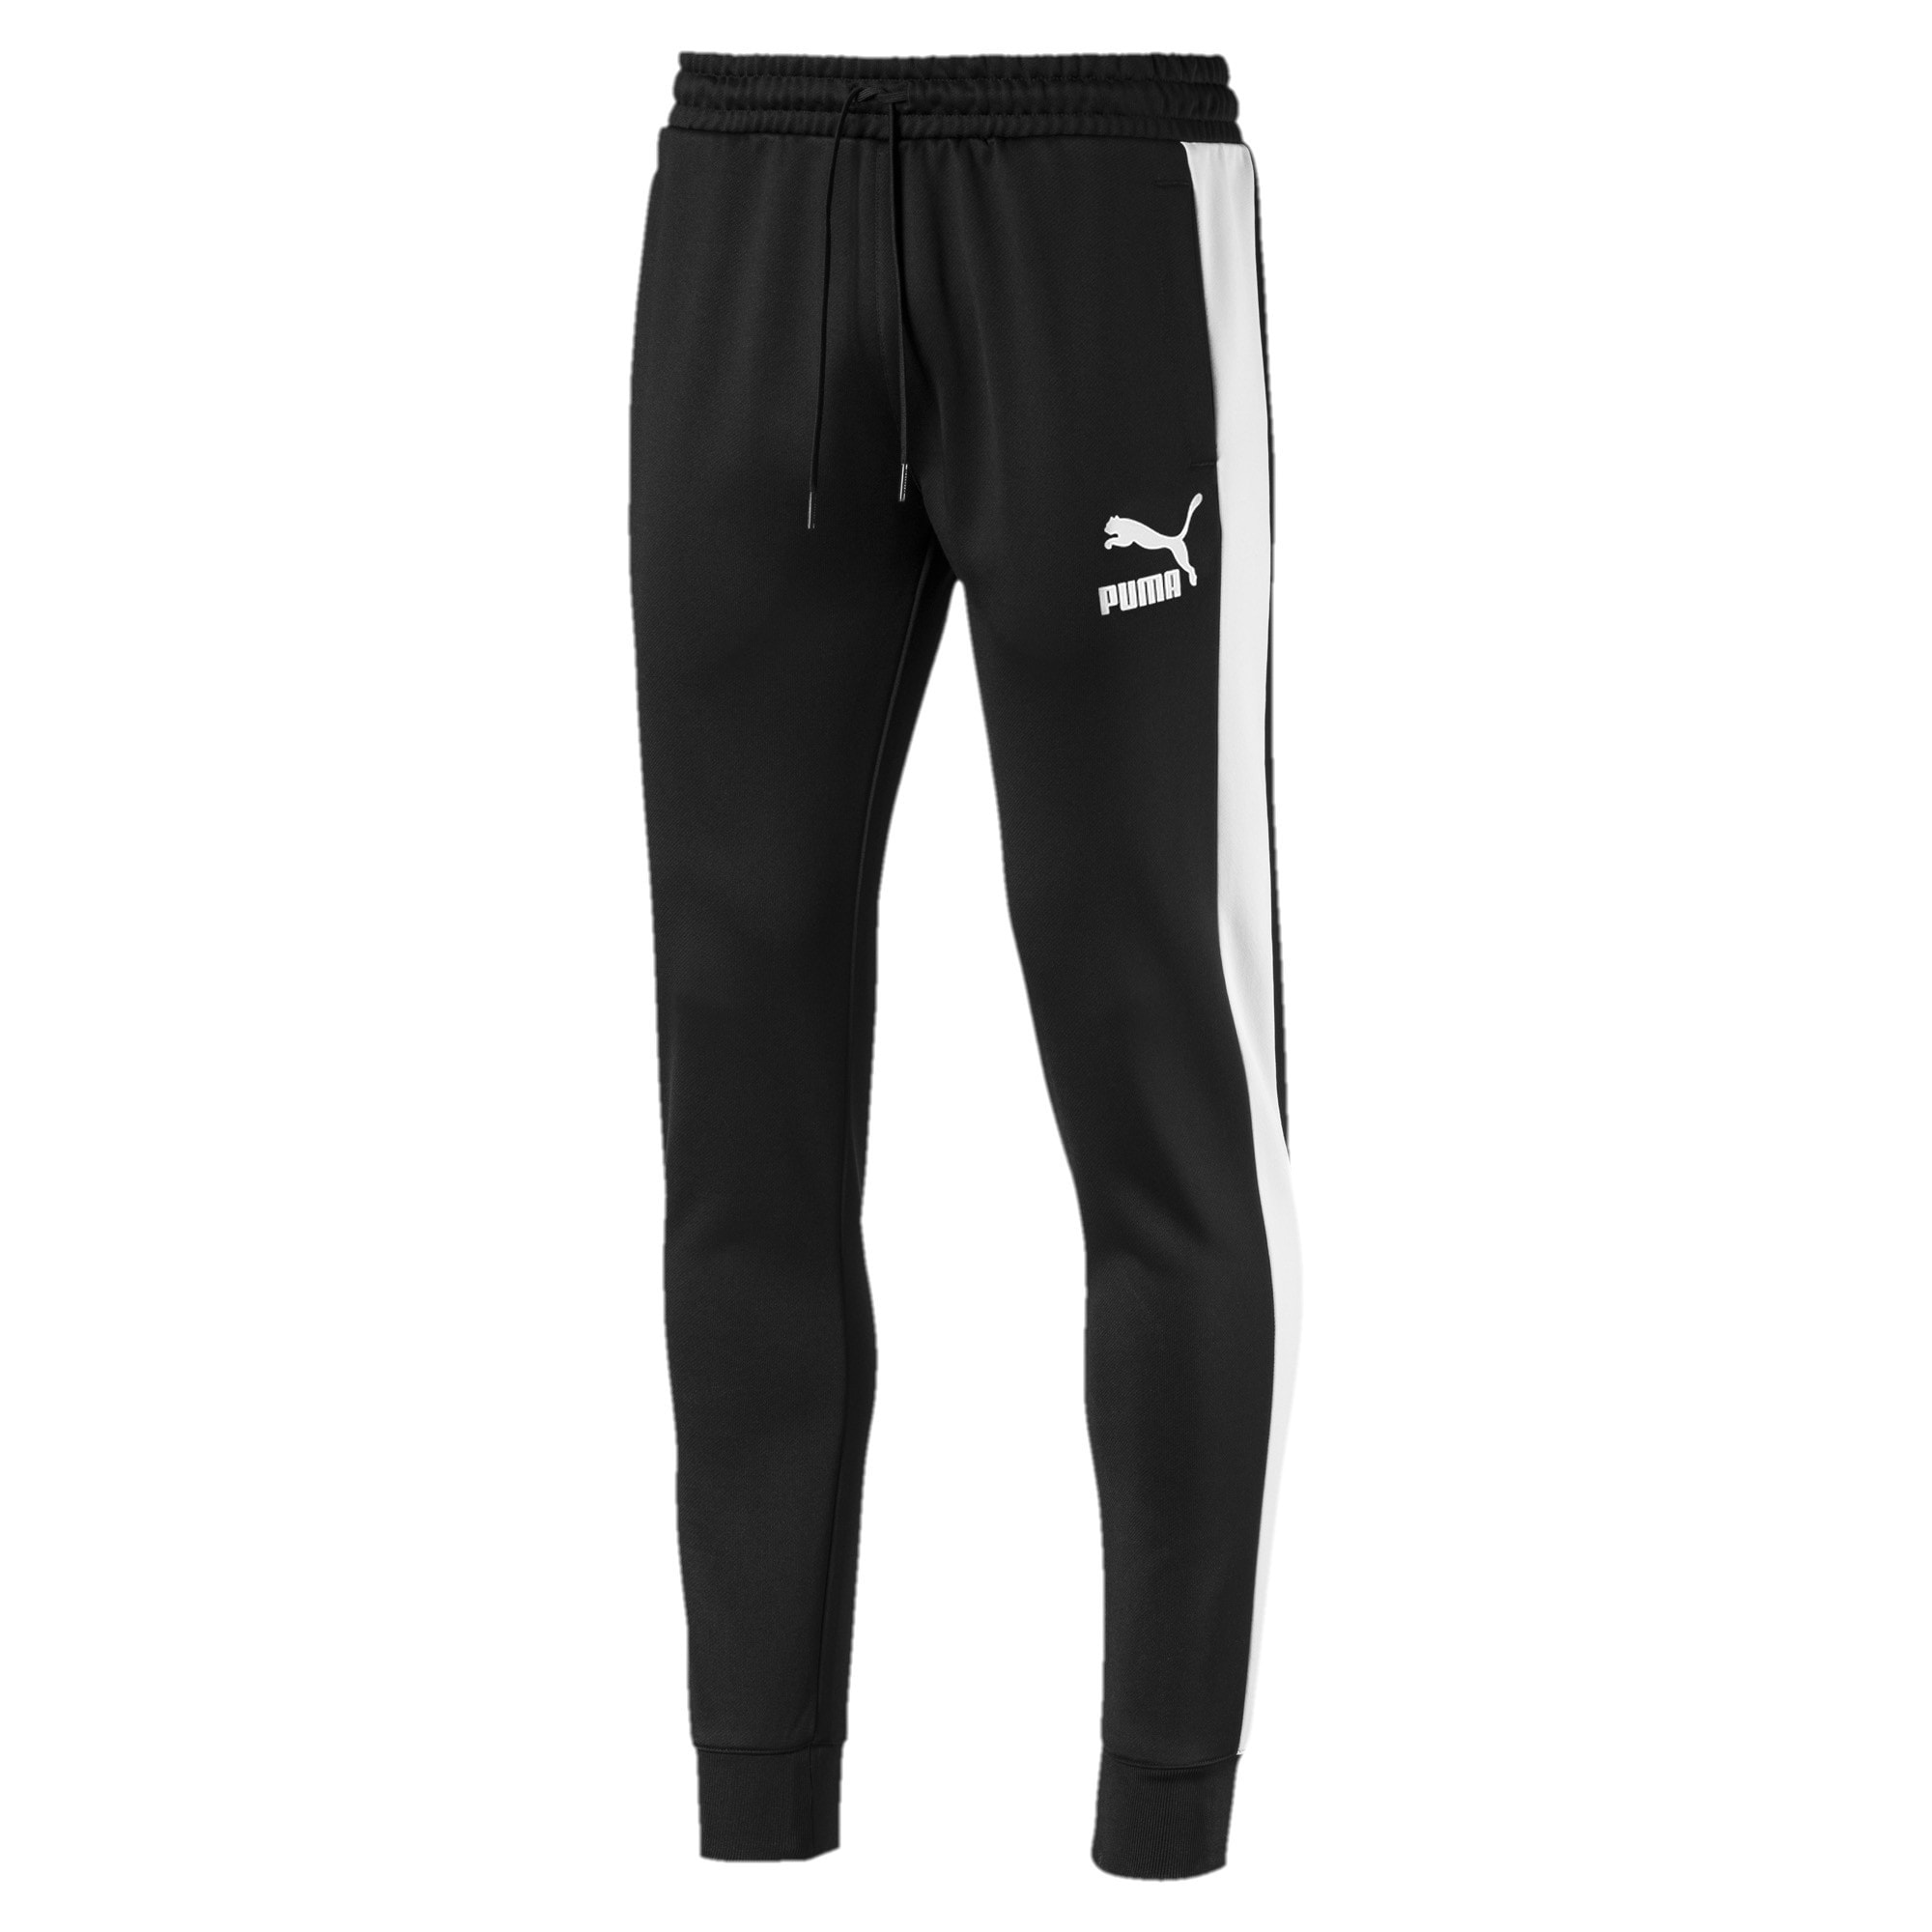 Thumbnail 4 of Iconic T7 Kntted Men's Sweatpants, Puma Black, medium-IND